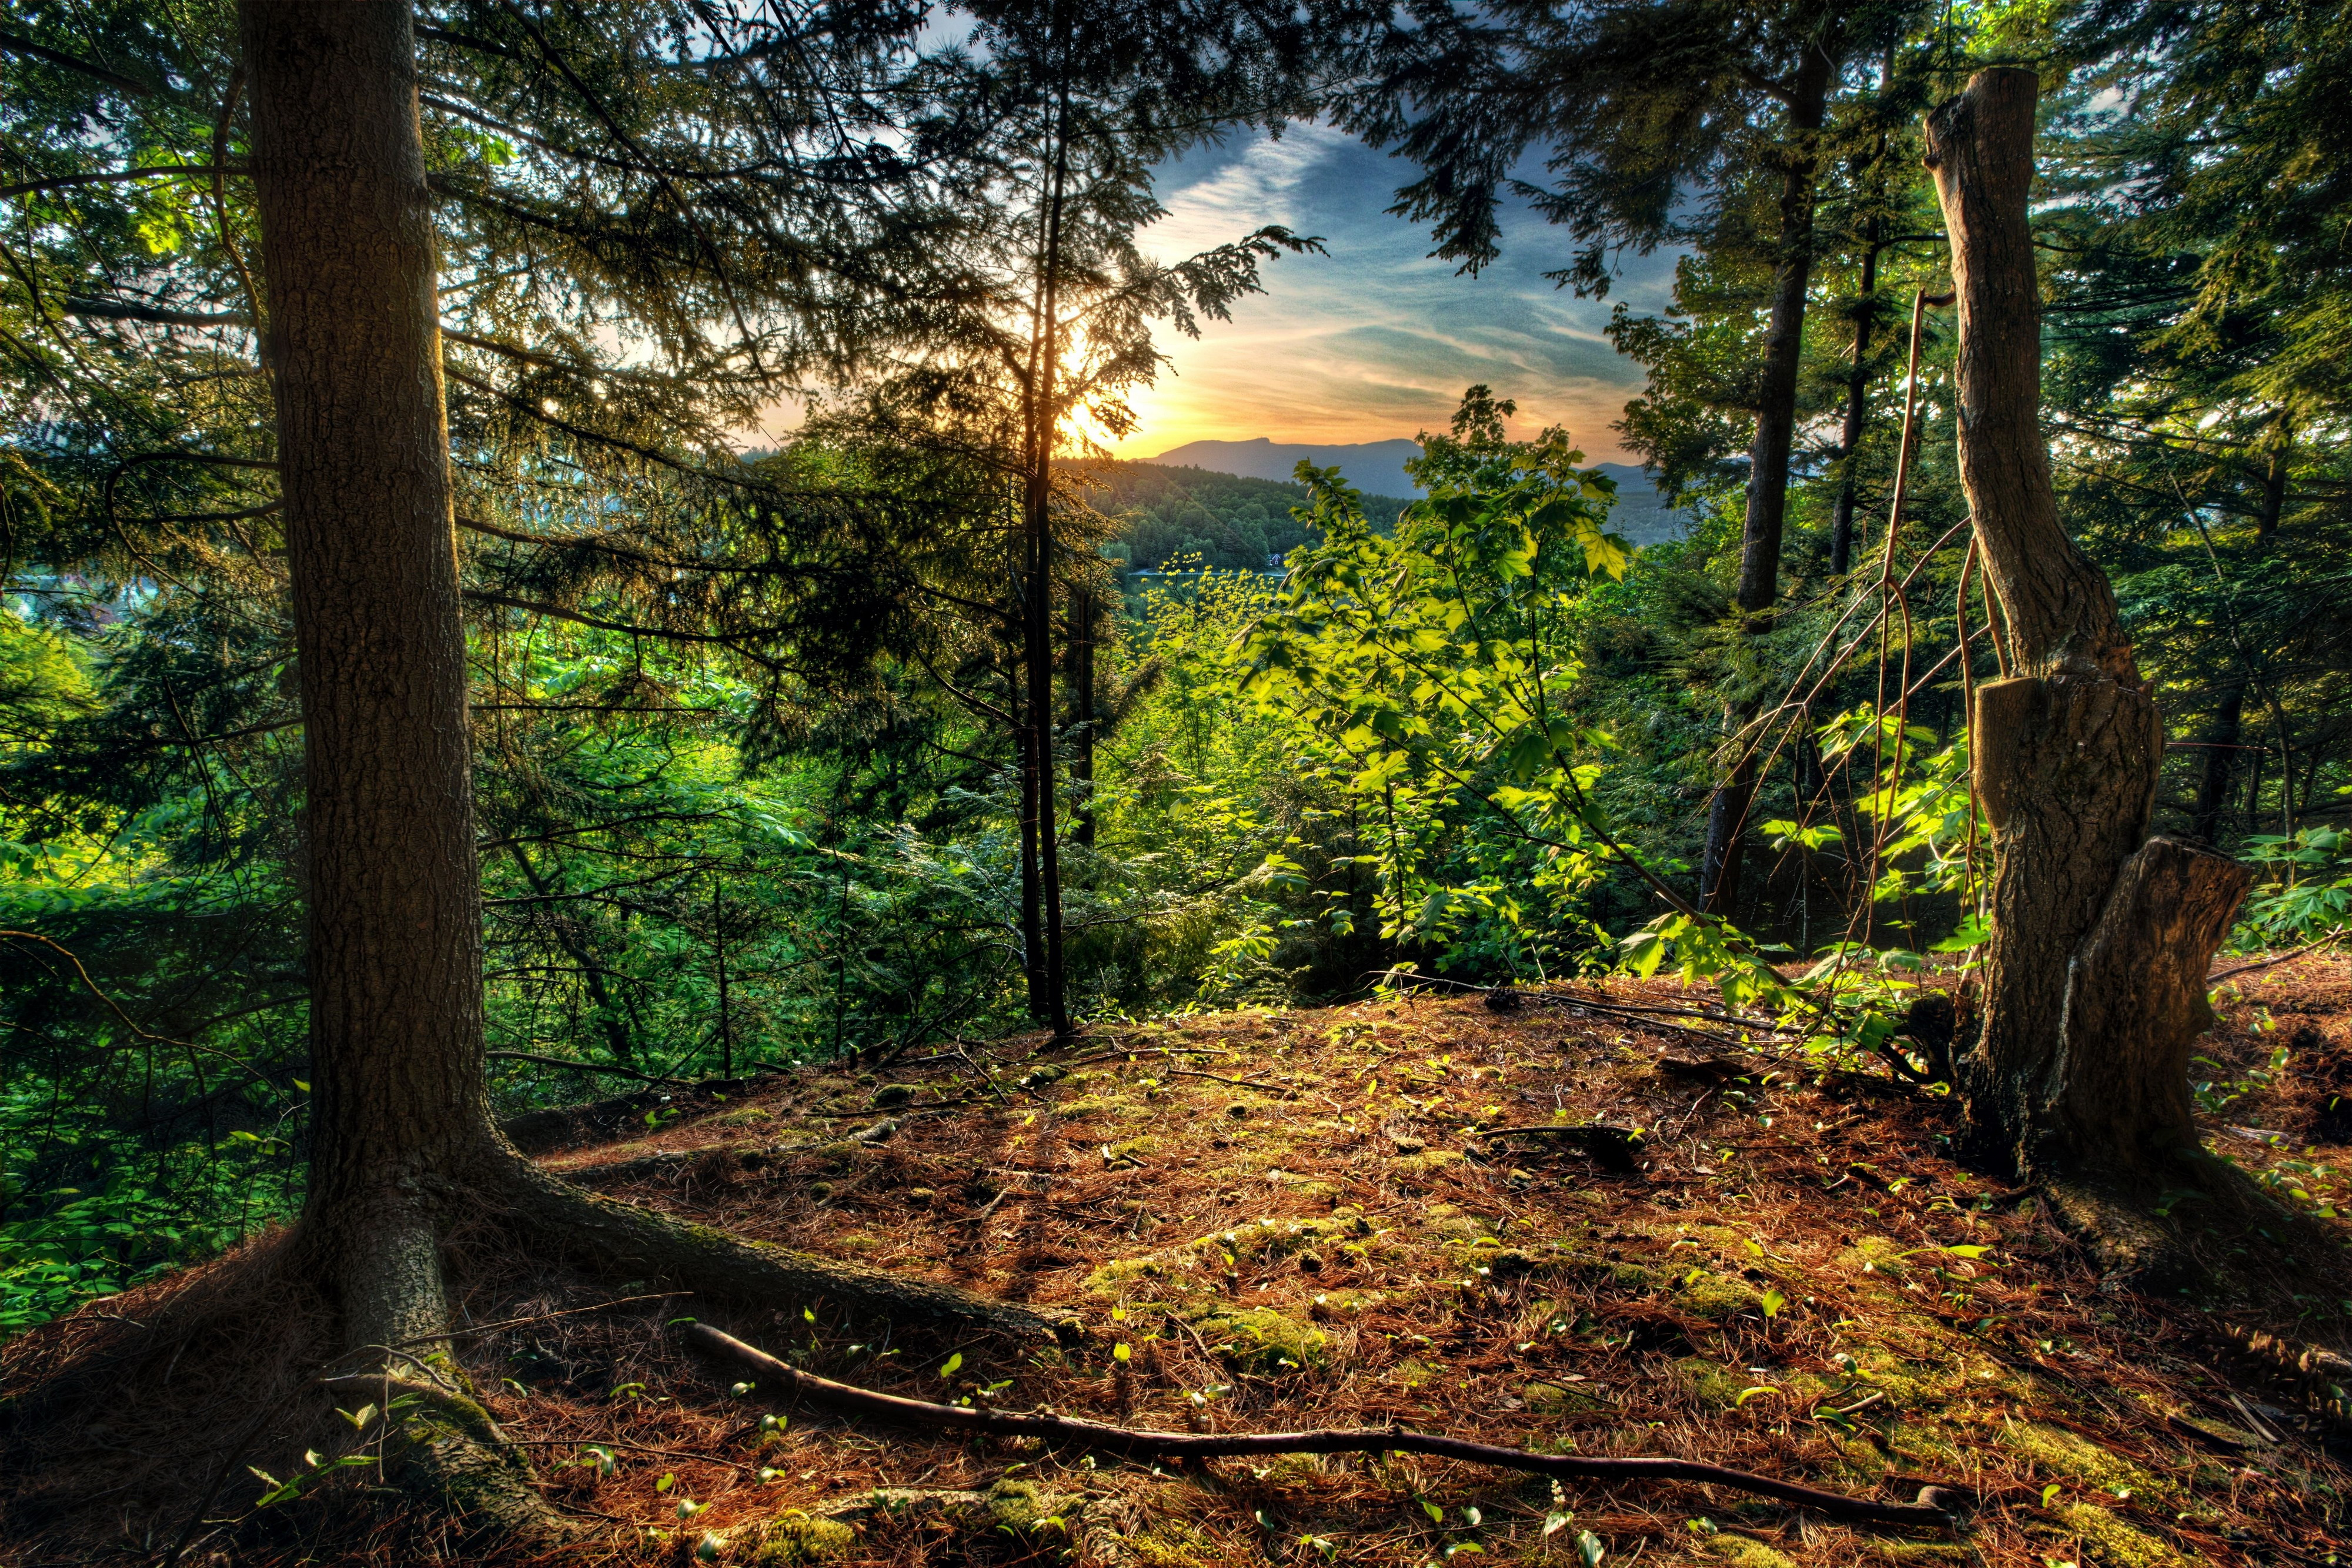 4k wallpaper nature redwoods - photo #30